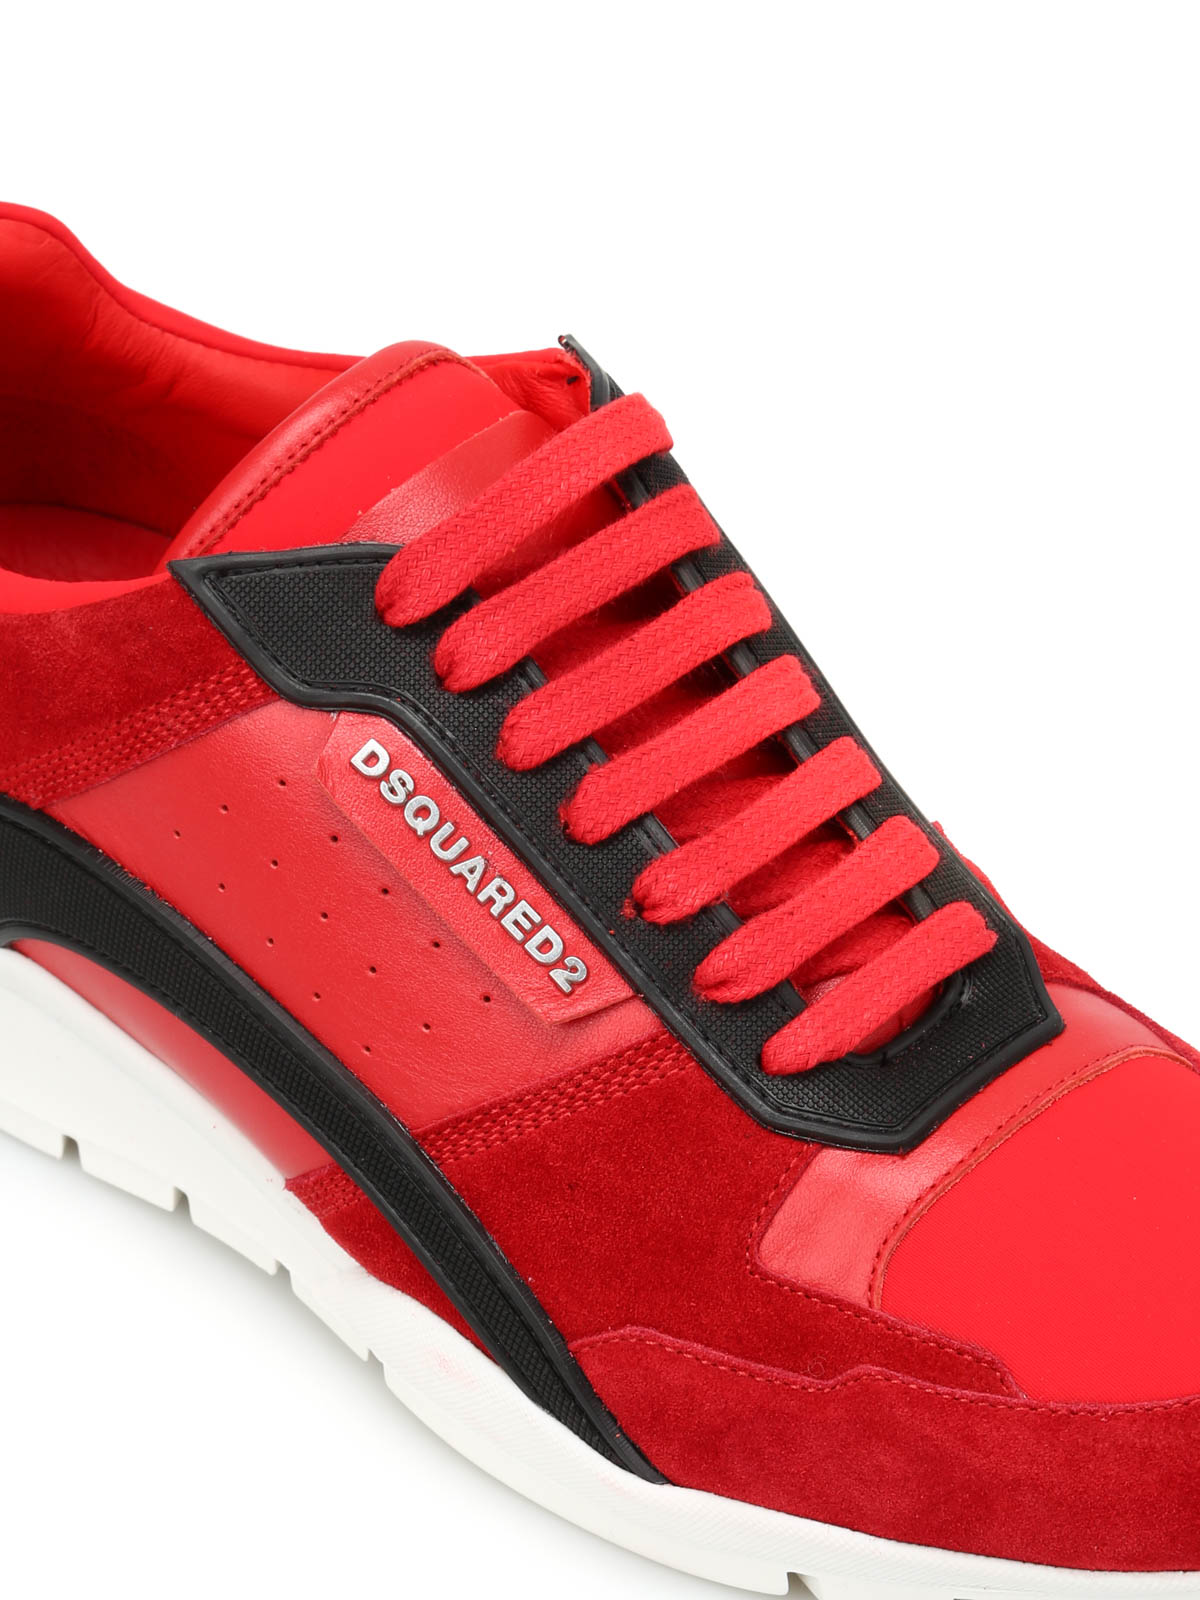 f3dae003fcc30c Dsquared2 - Sneaker Kit - Rot - Sneaker - SN4375284065   iKRIX Shop ...